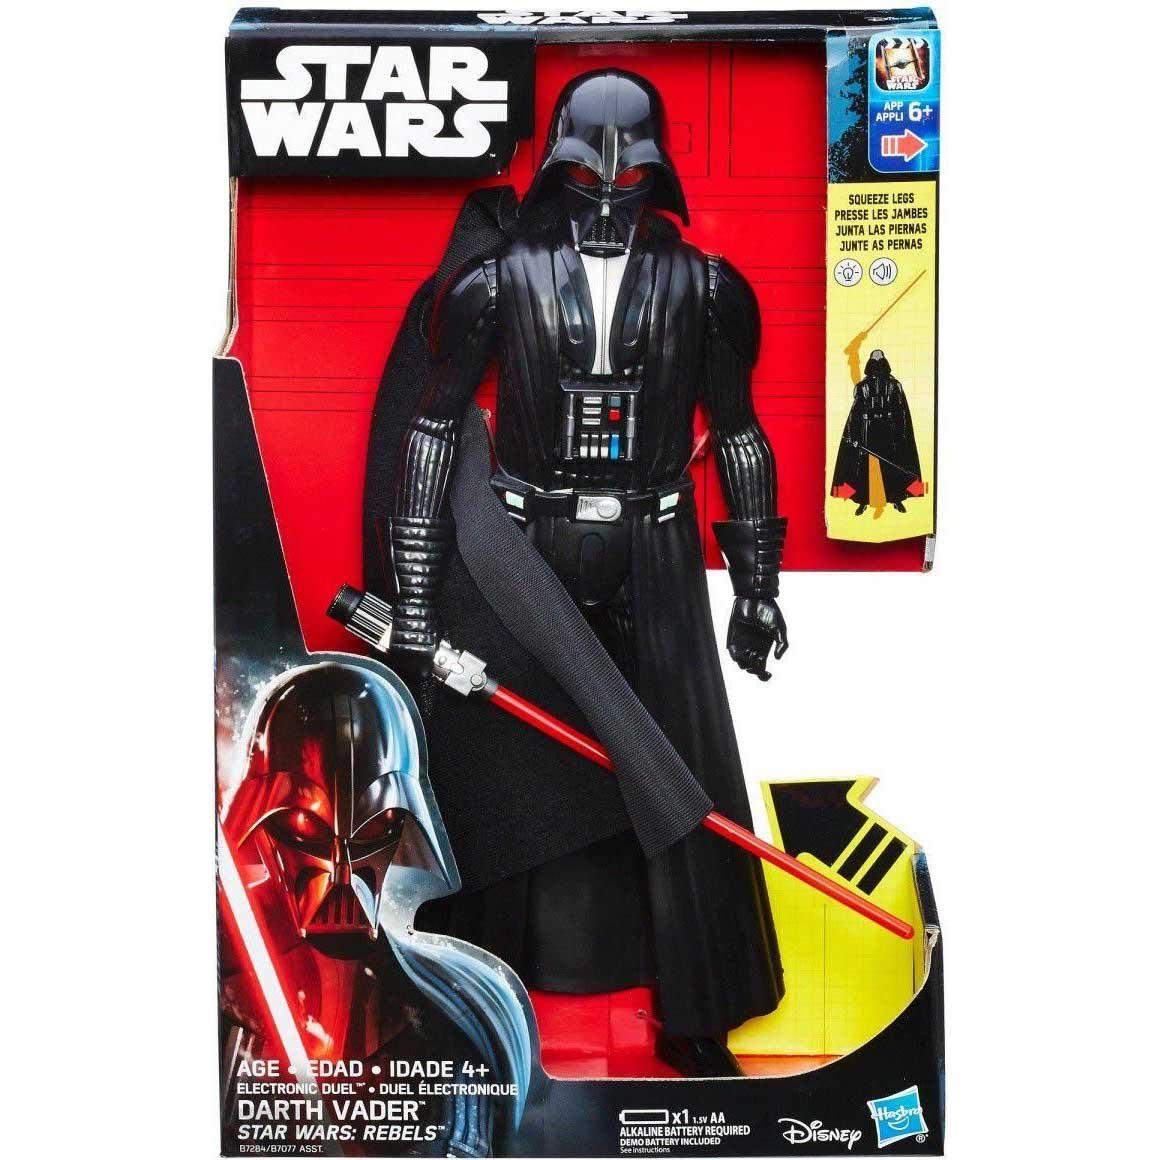 Star Wars Galactic Heroes Dueling Darth Vader Sith Lord